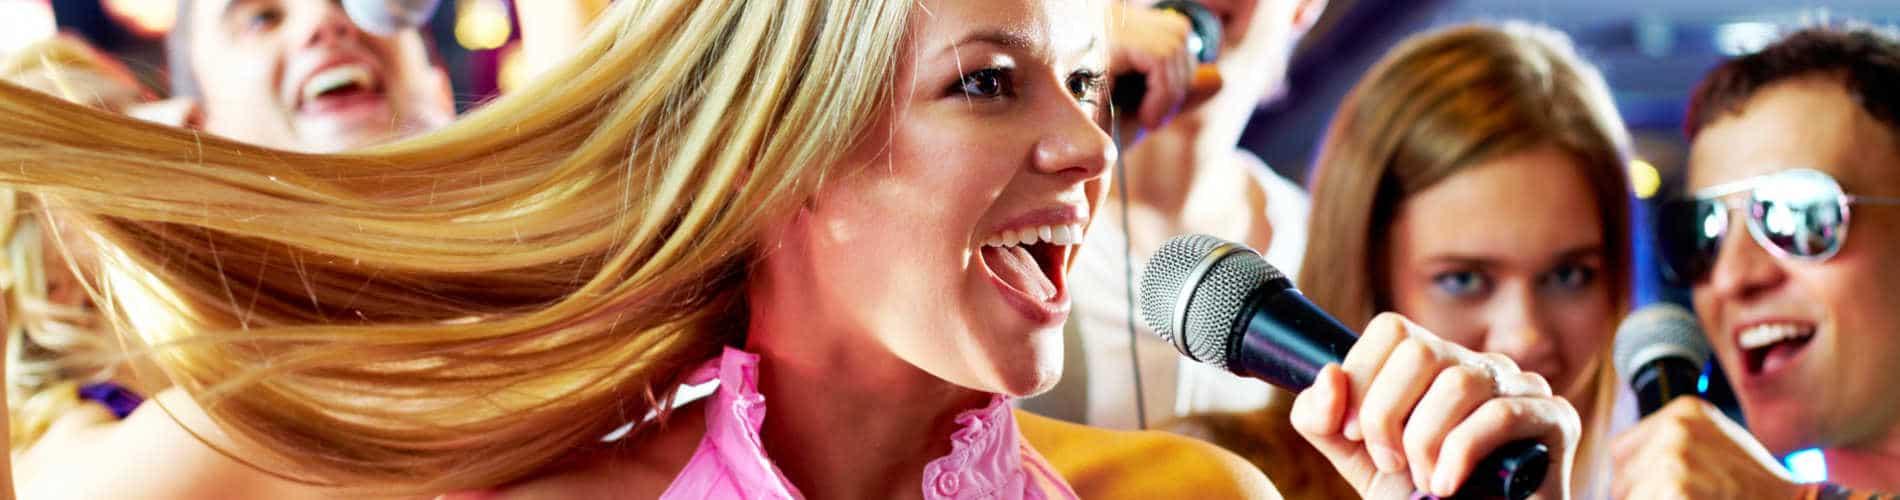 Chanteurs de karaoké